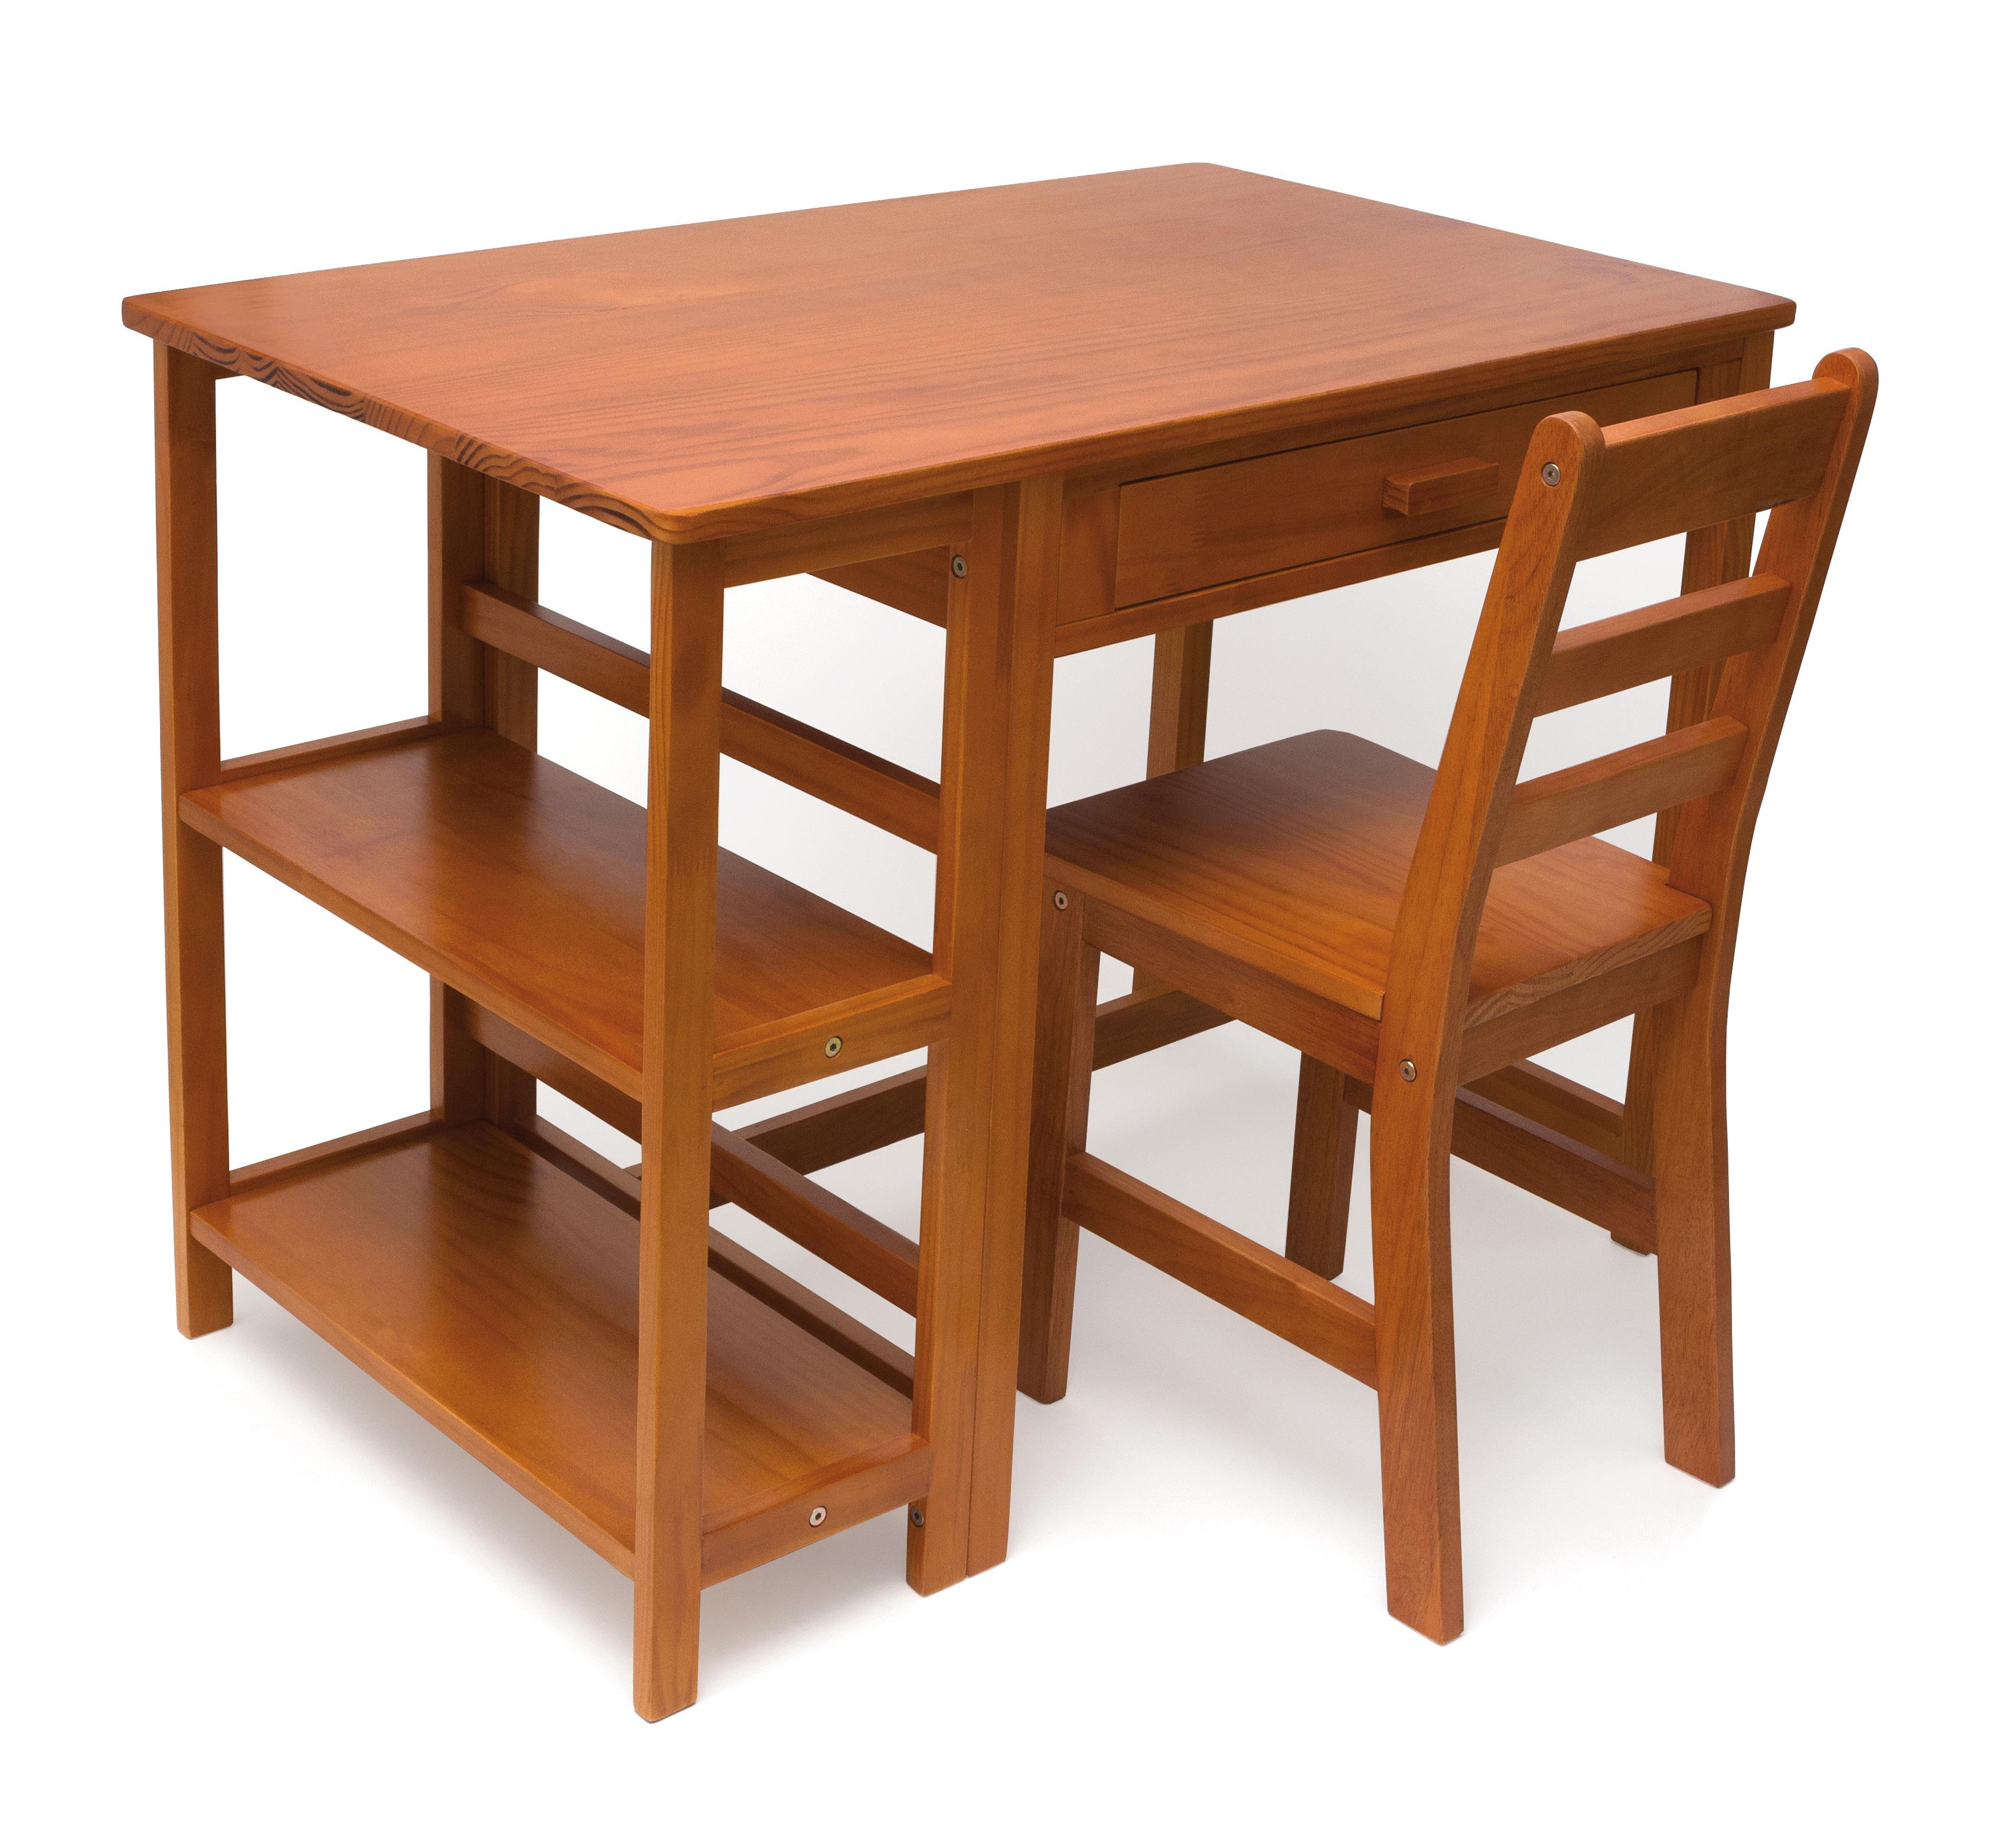 Childu0027s Work Station And Chair, Pecan Finish | Lipper International Desk U0026  Chair Sets